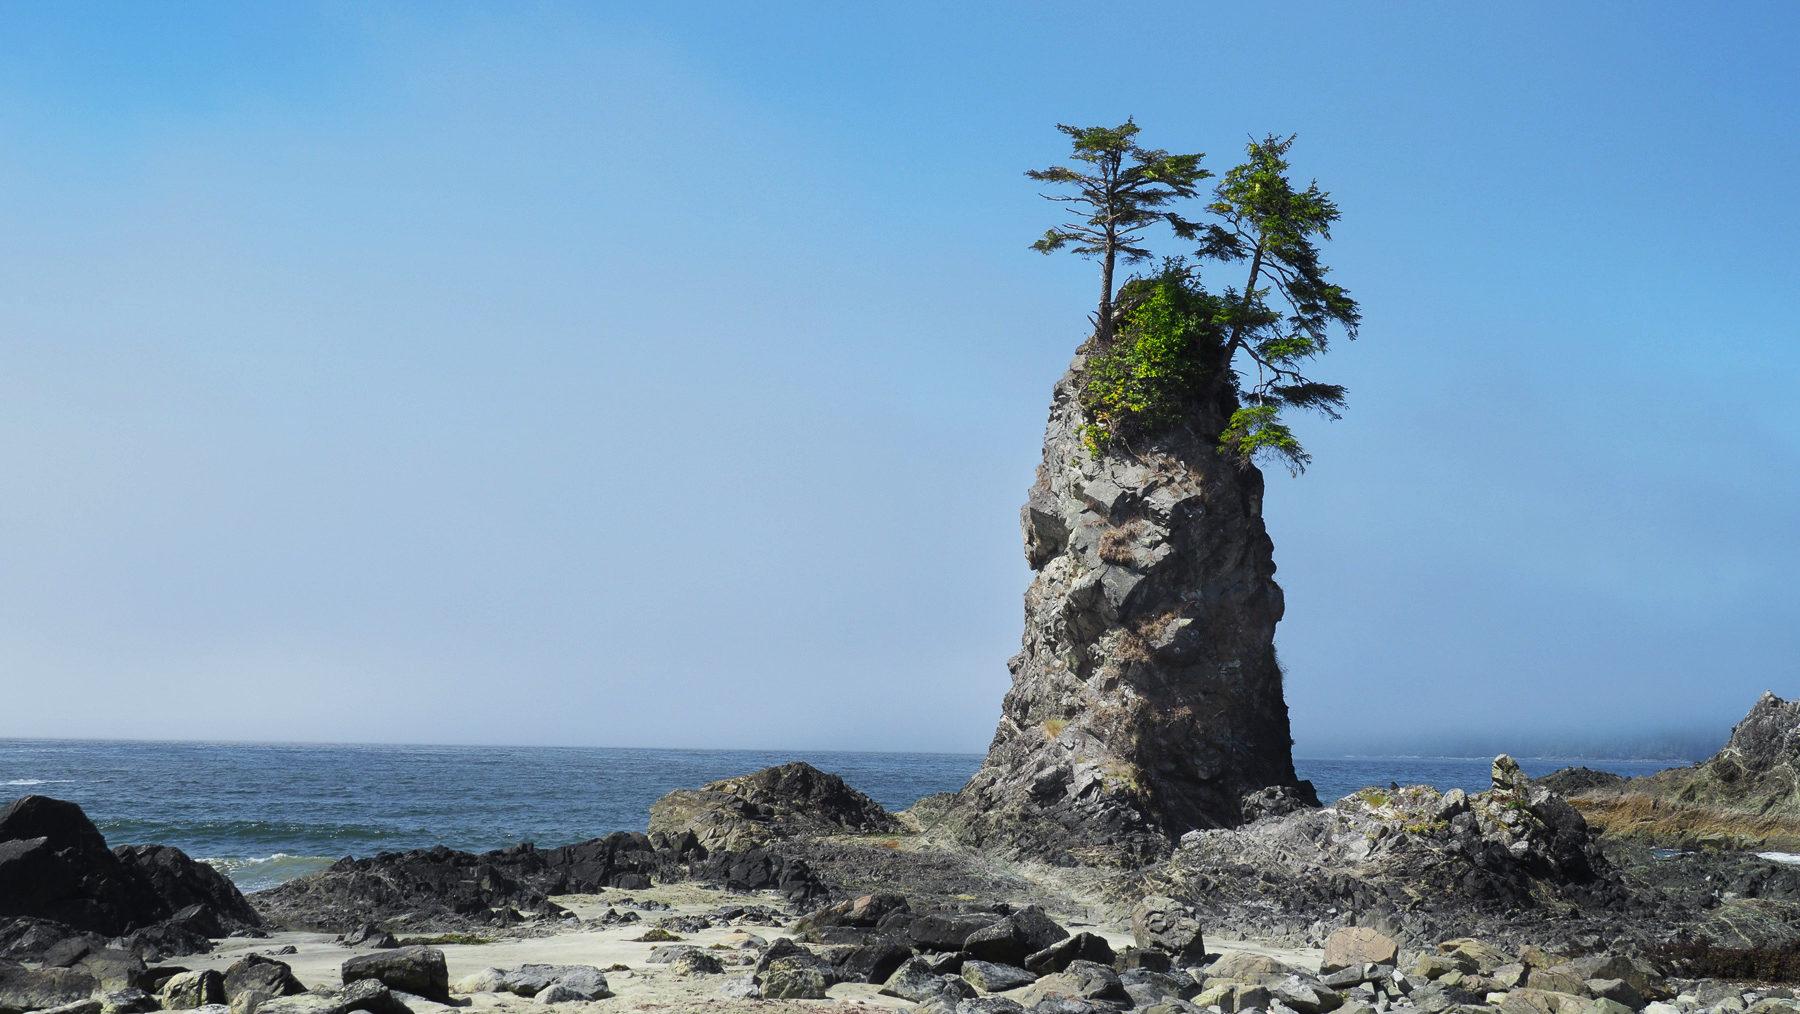 bizarre korrige Bäume auf kleinen Felsinseln